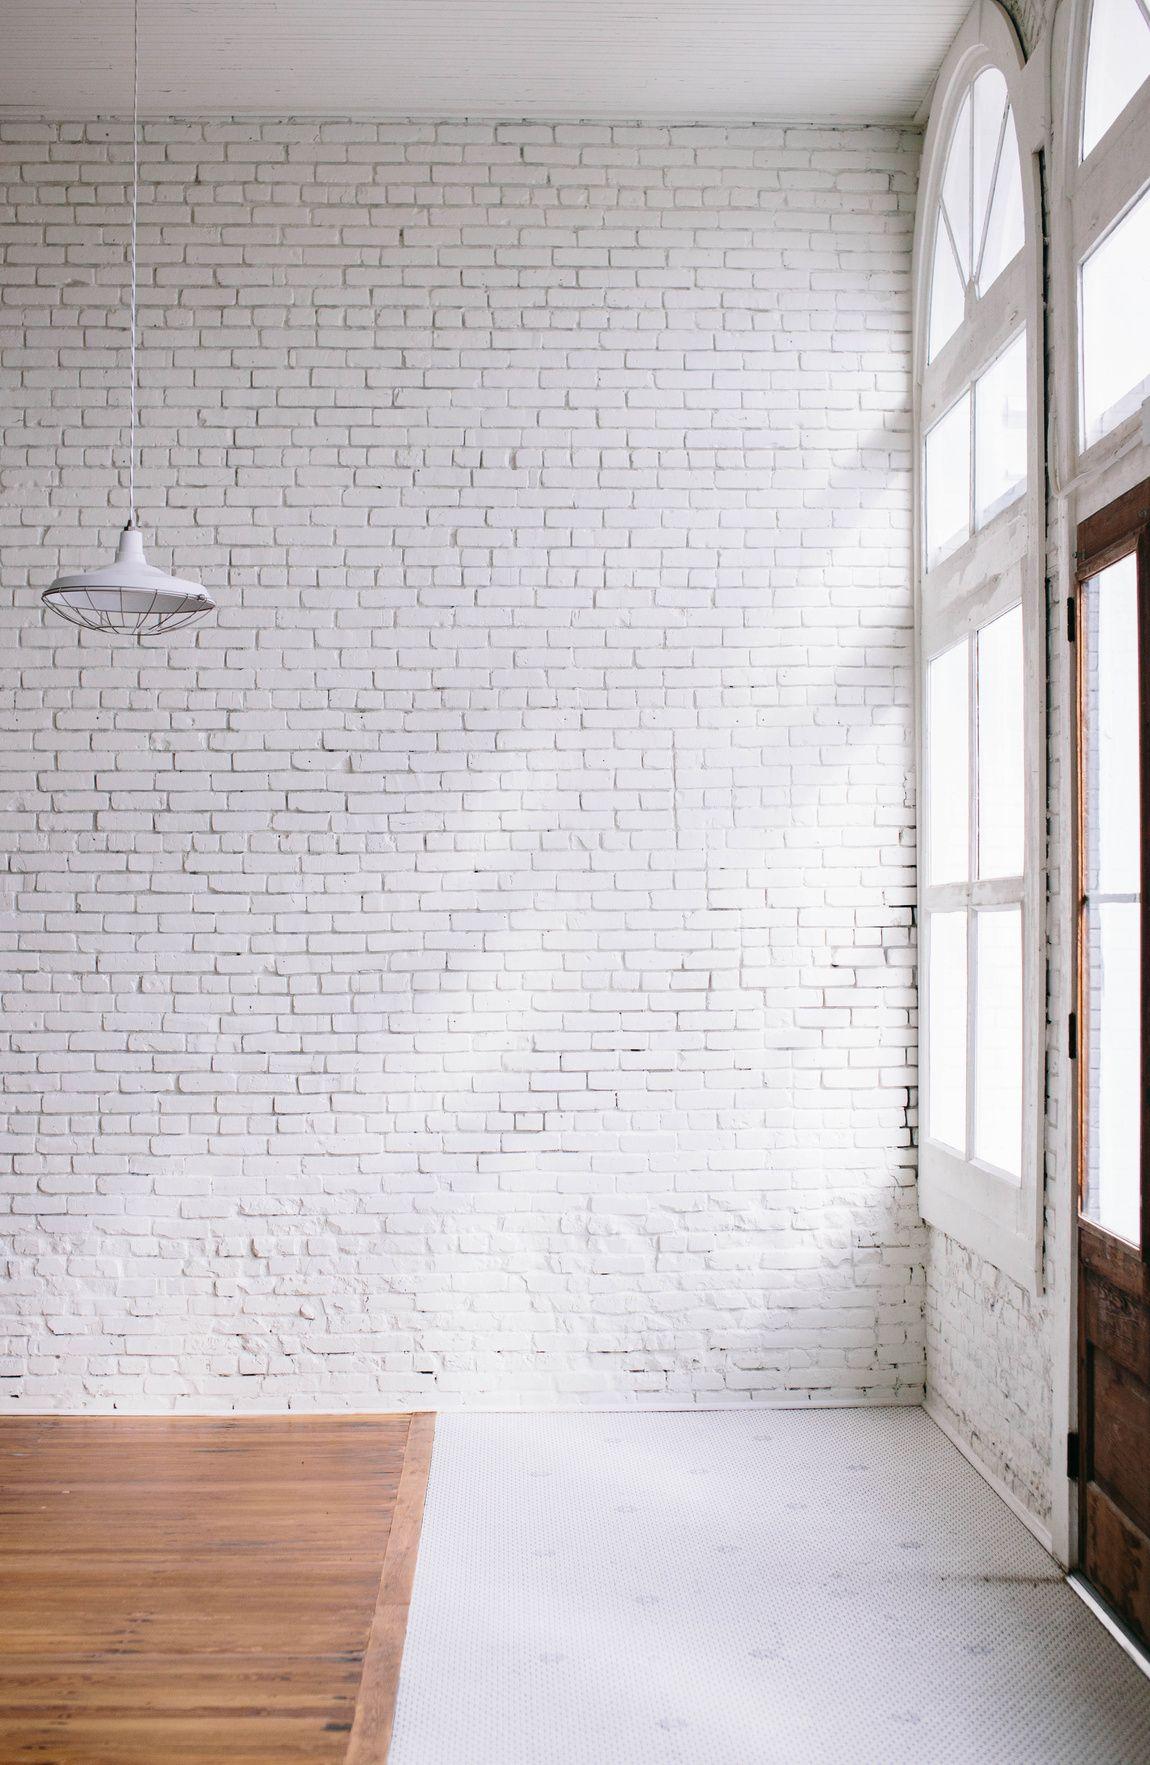 One Eleven East White Brick Walls Brick Interior Wall White Brick